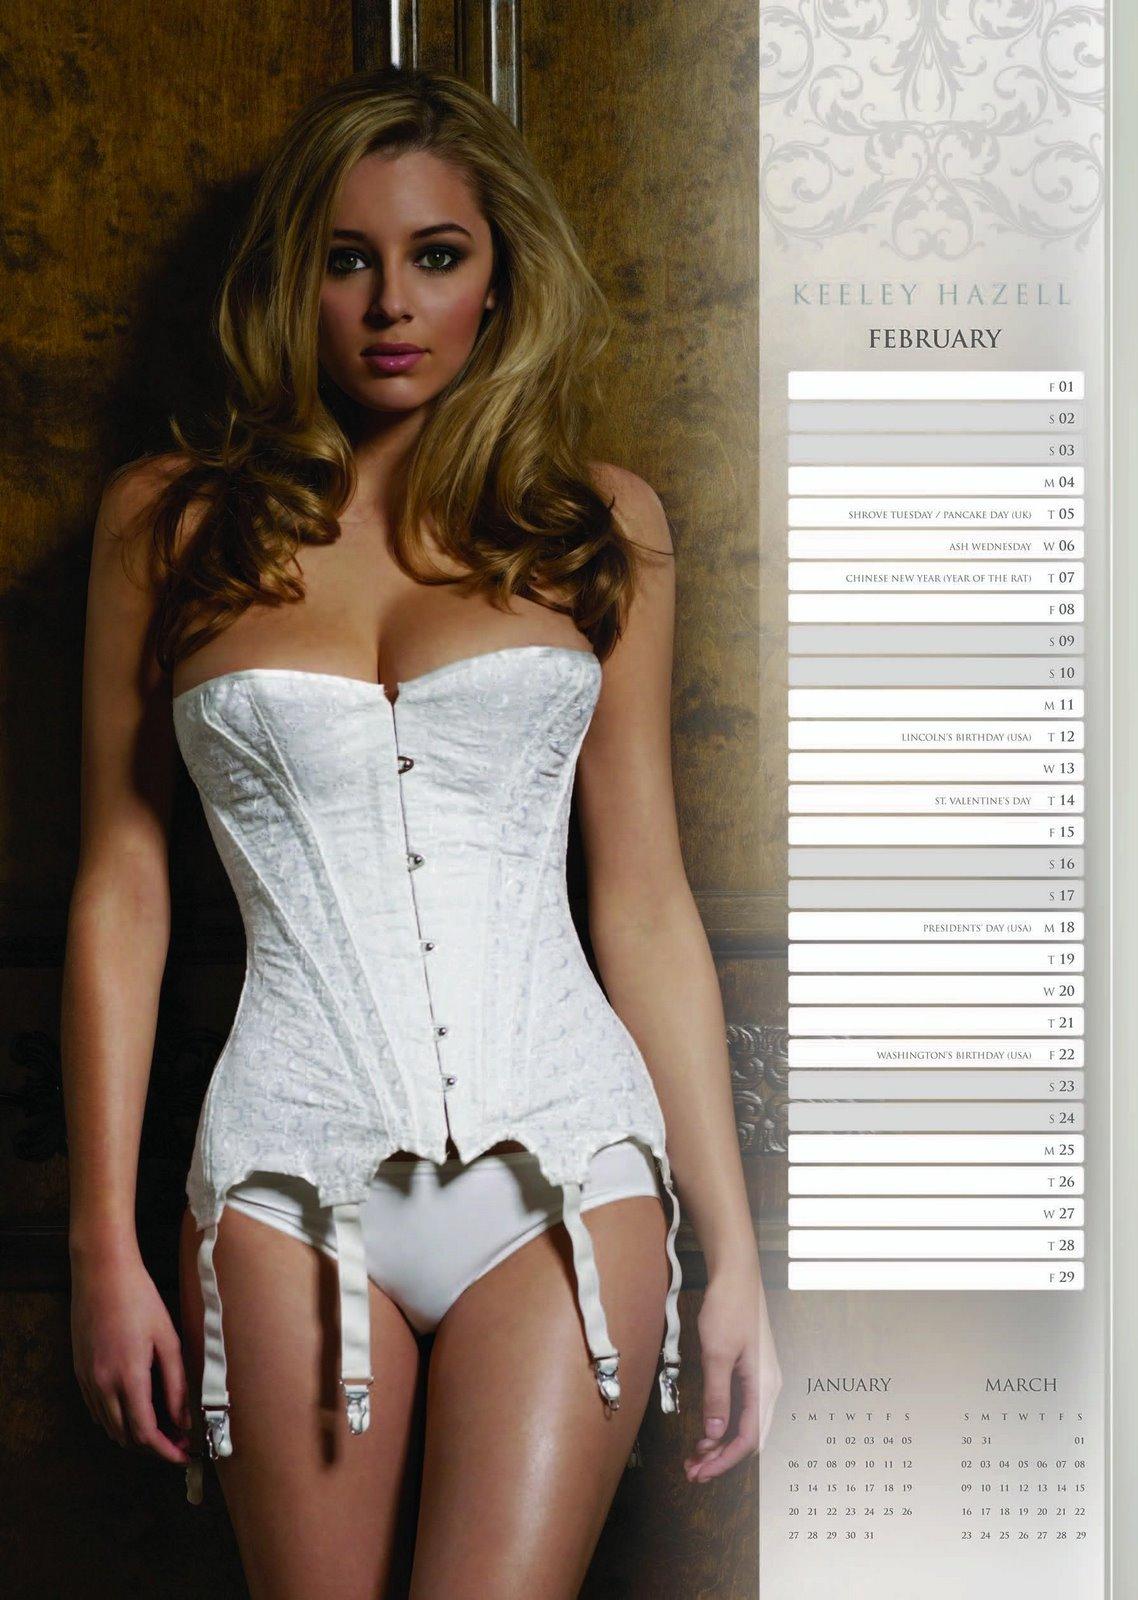 Download full size Official Calendar 2008 february Keeley Hazell wallpaper / 1138x1600